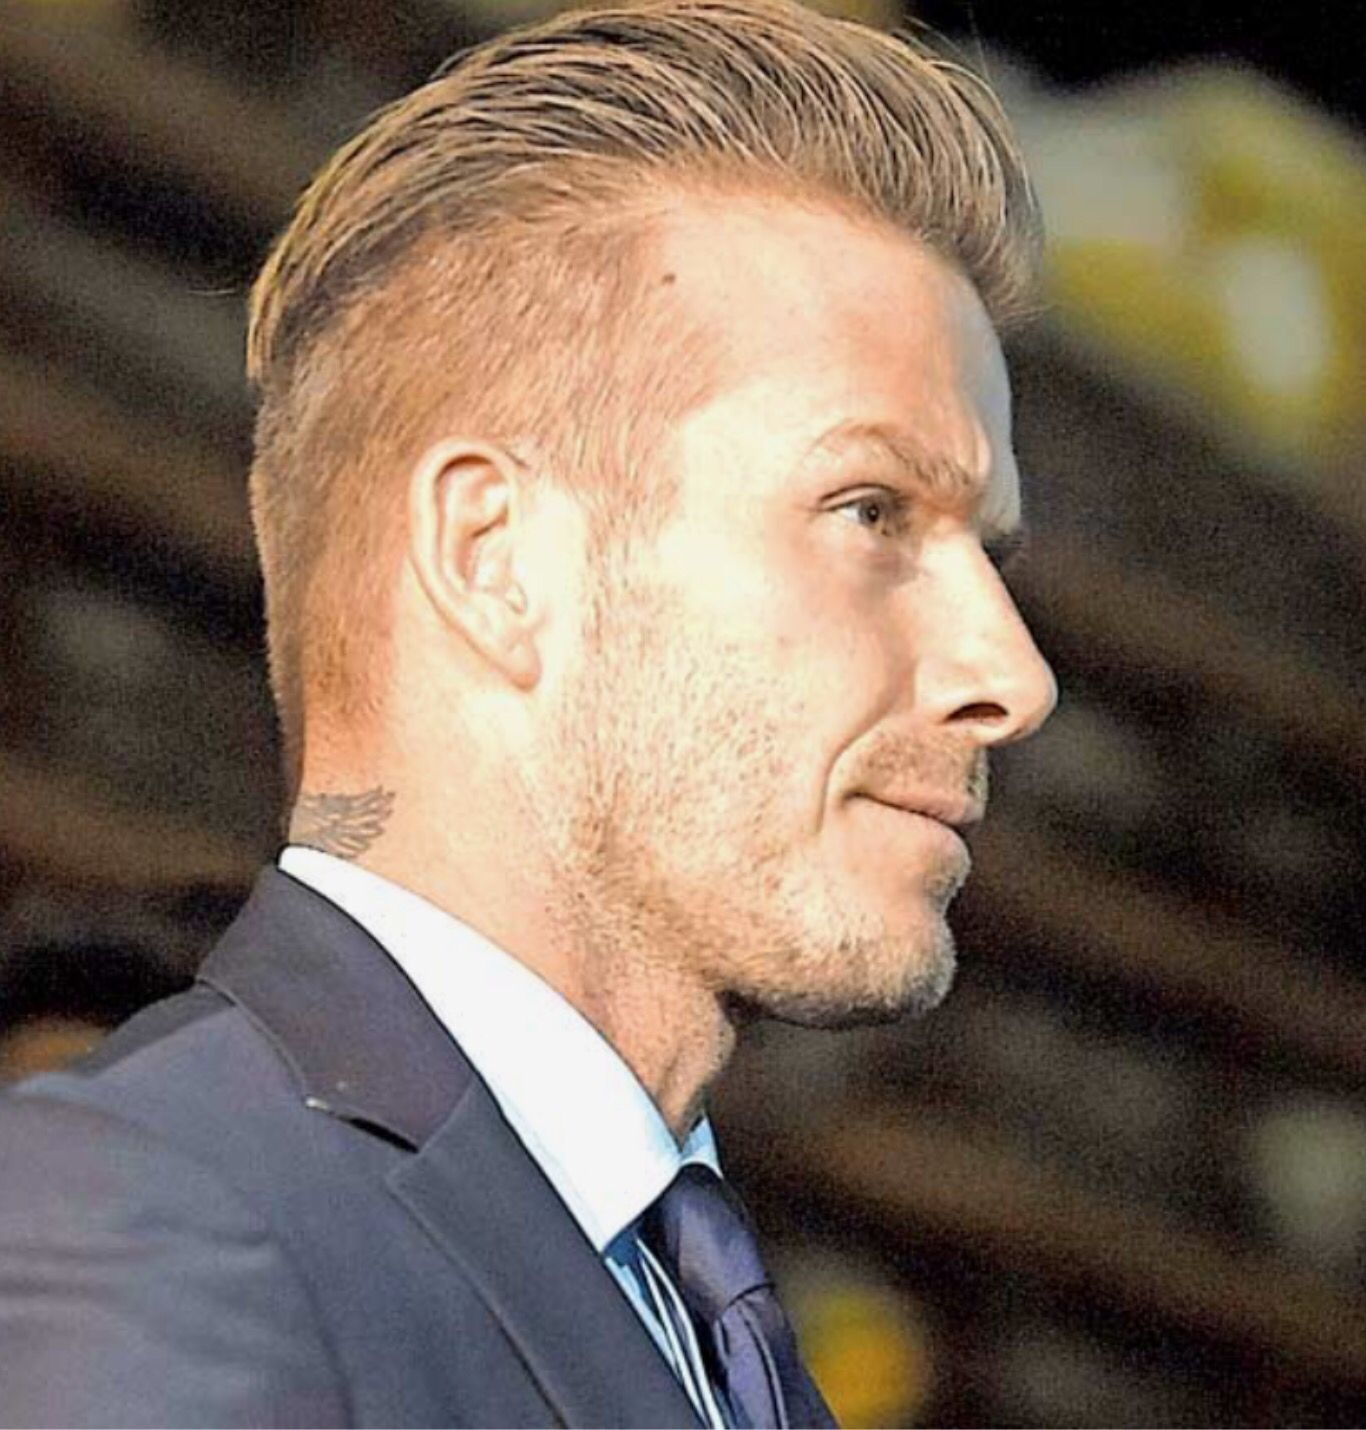 hairstyle david beckham 2019